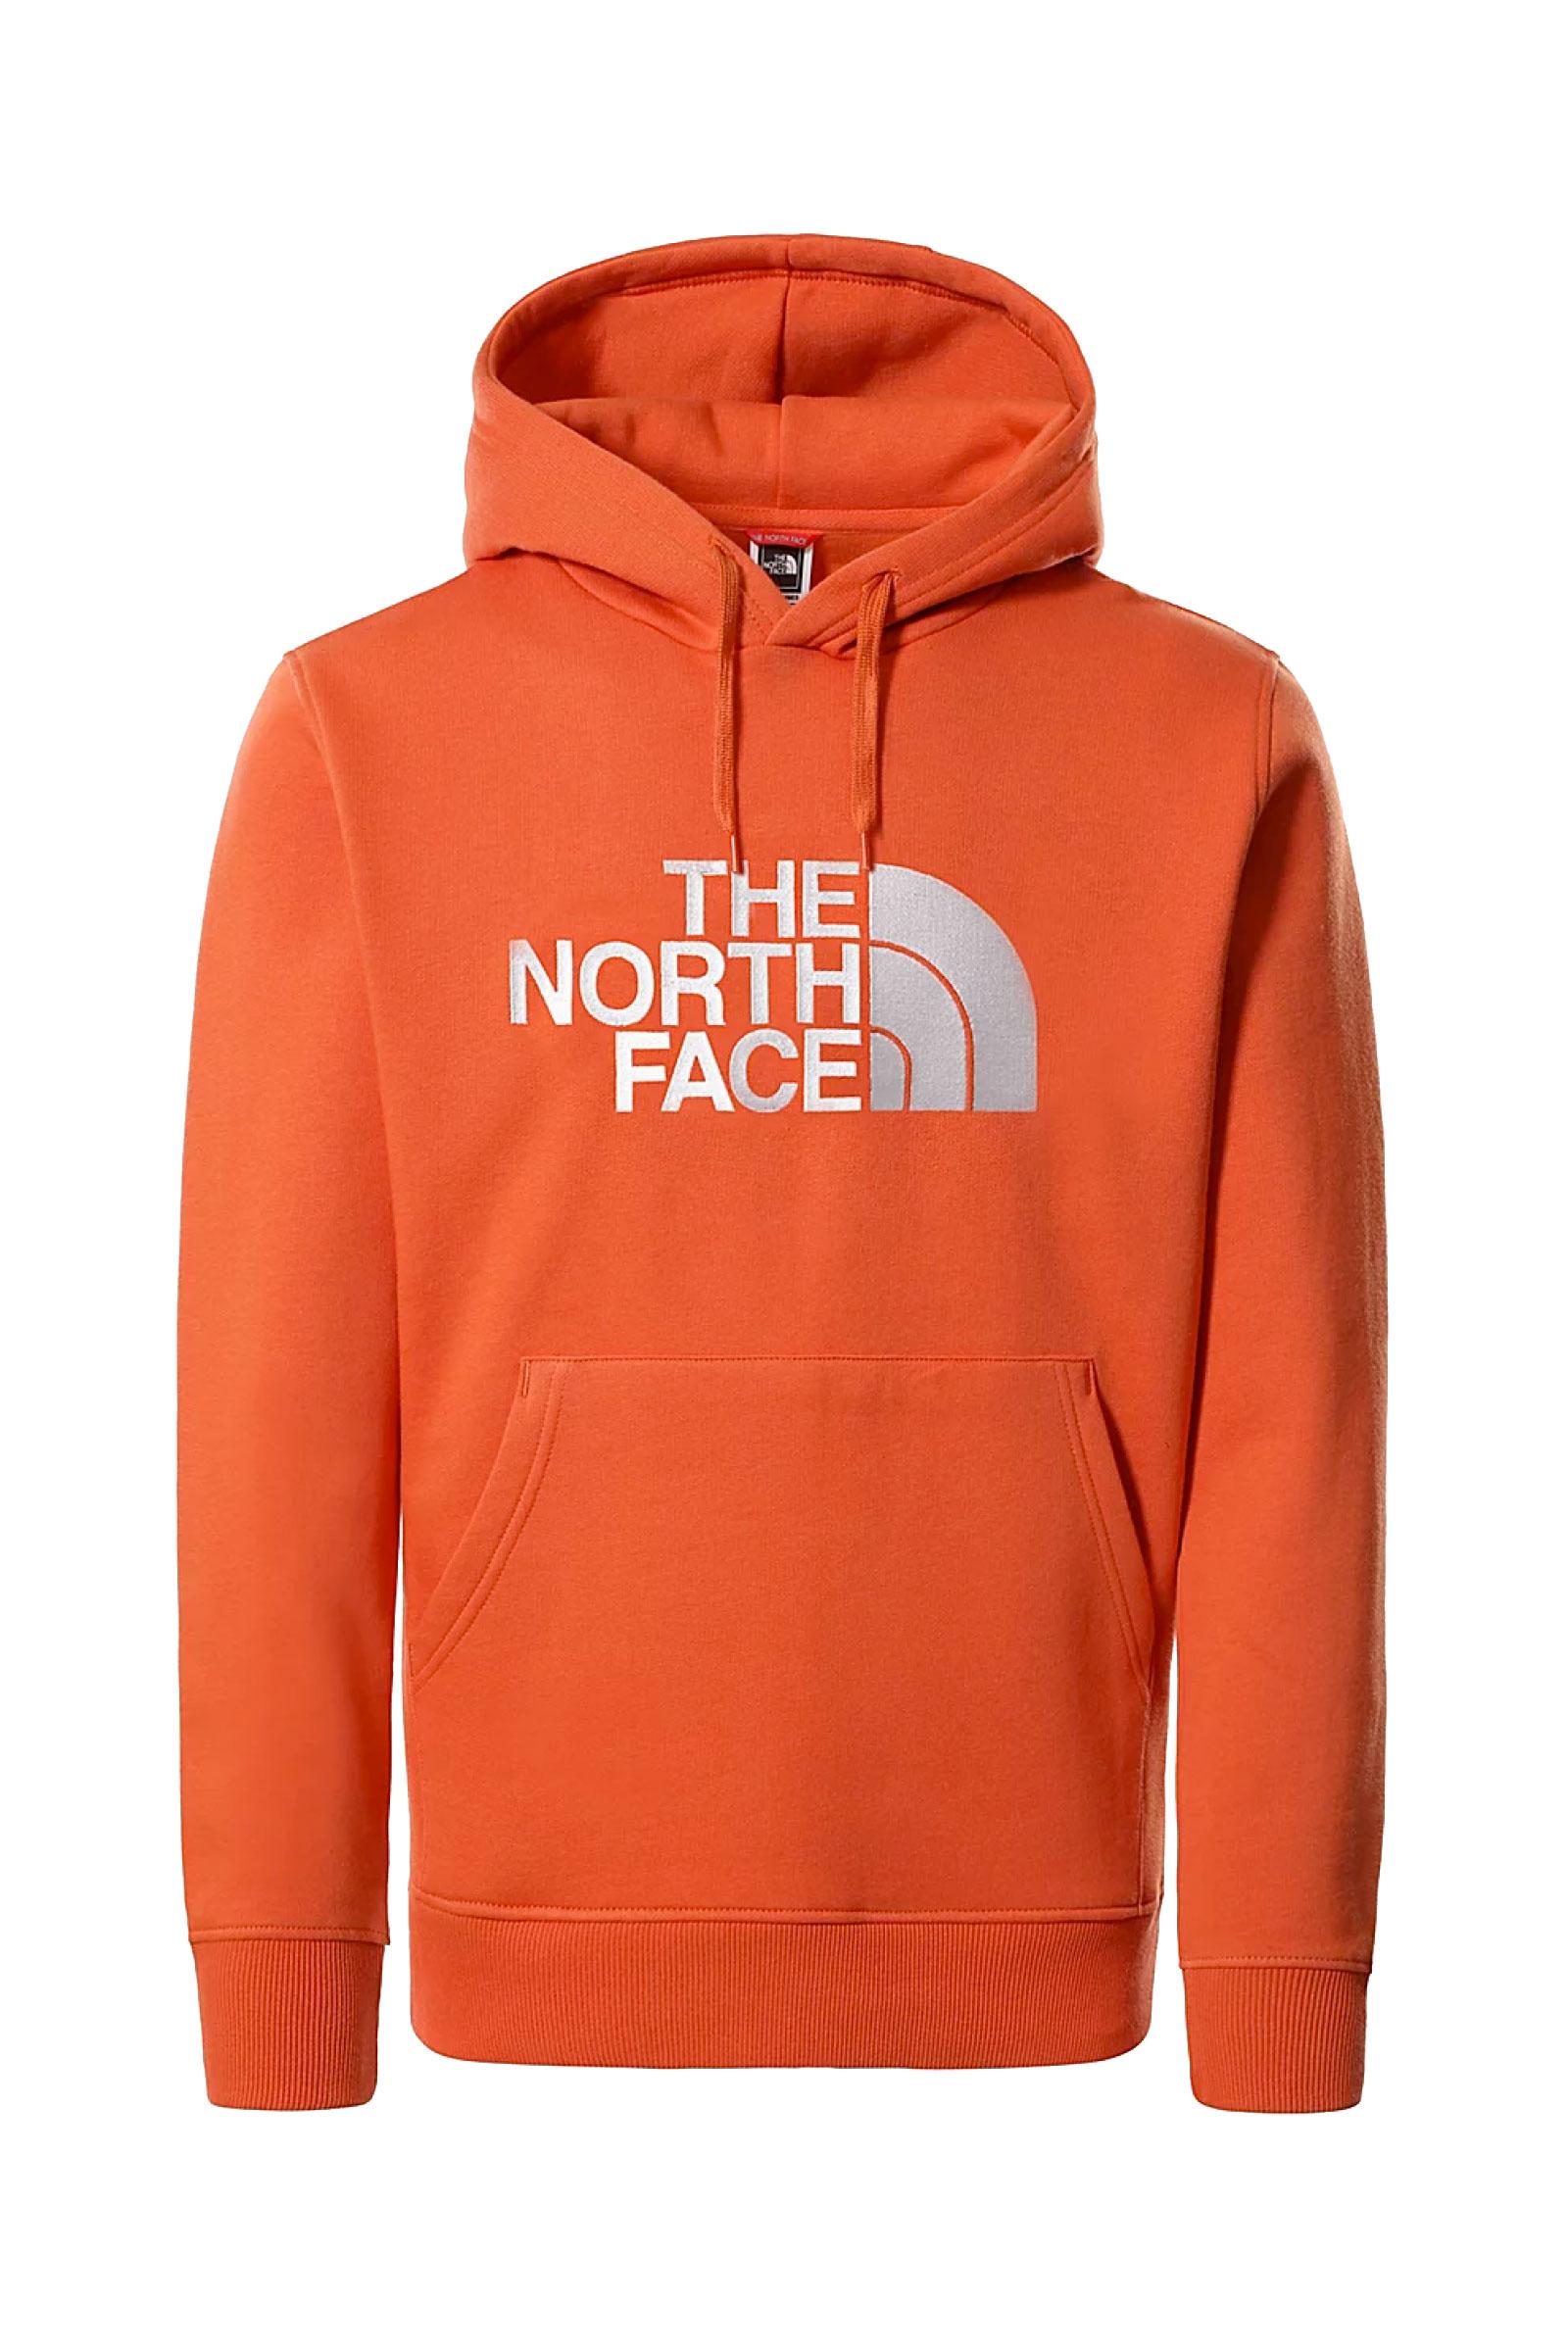 THE NORTH FACE   Sweatshirt   NF00AHJYEMJ